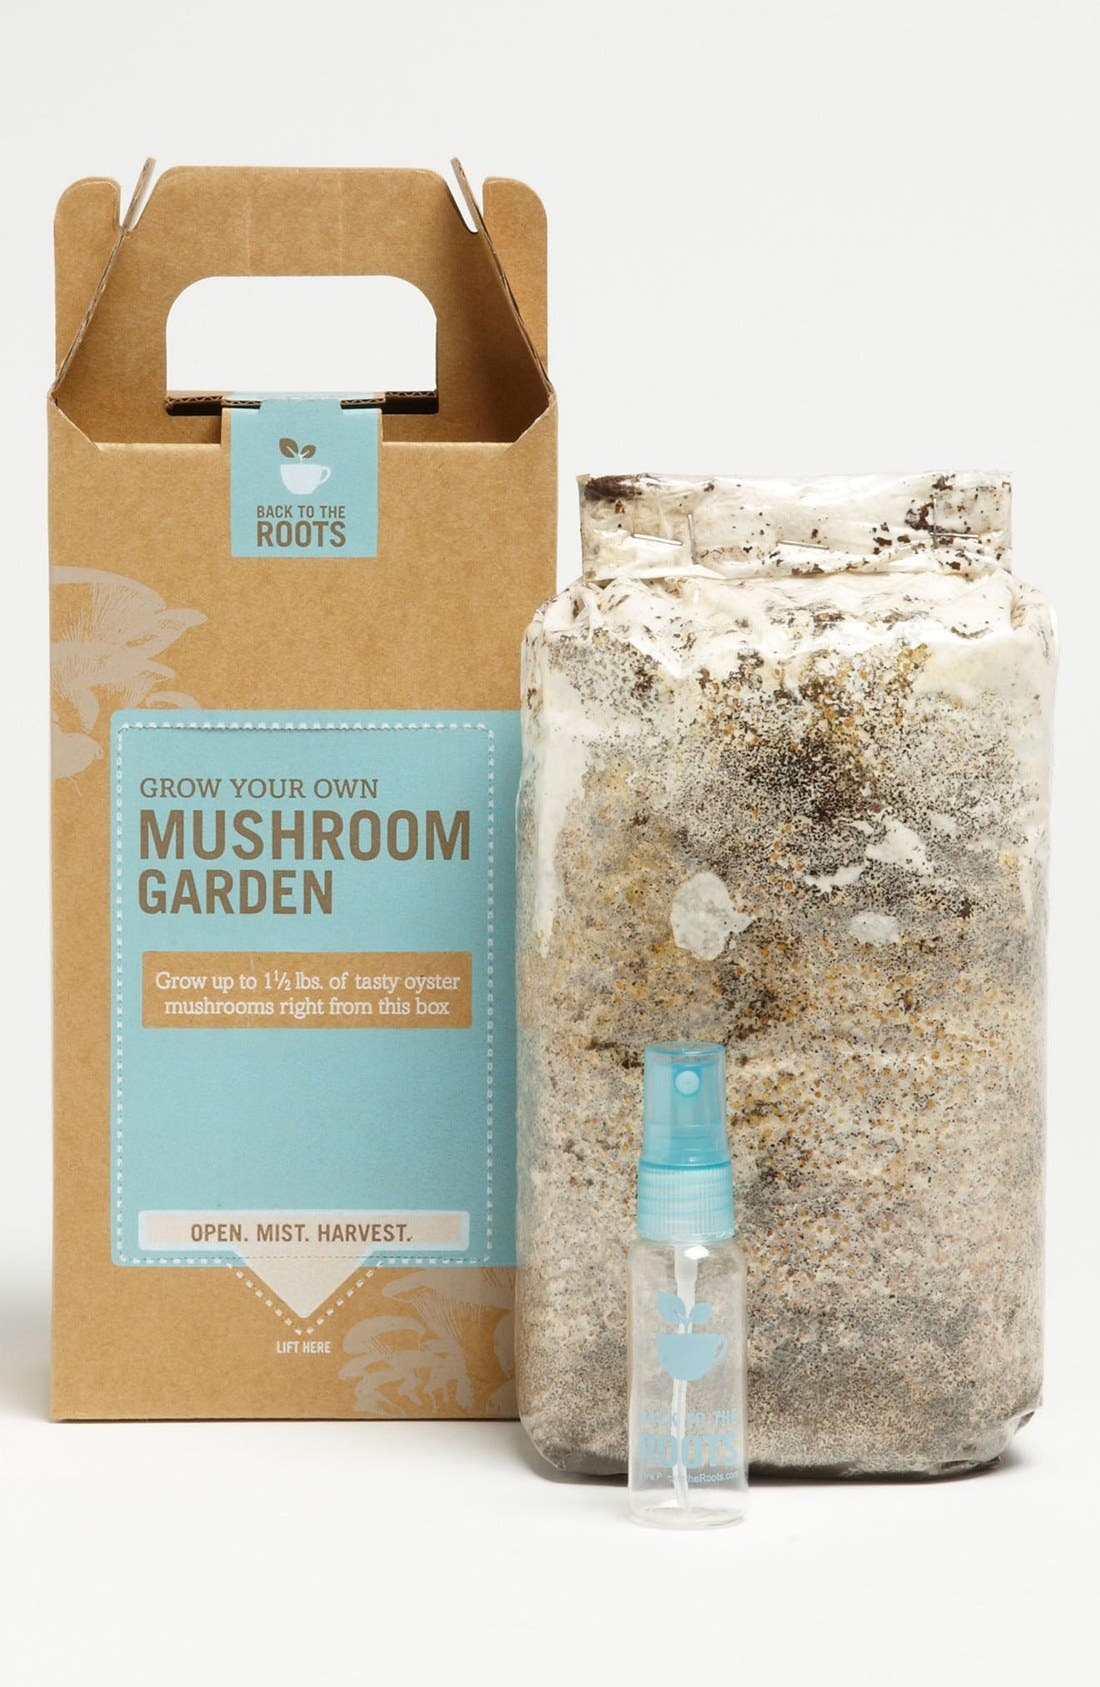 Main Image - Back to the Roots Mushroom Garden Kit